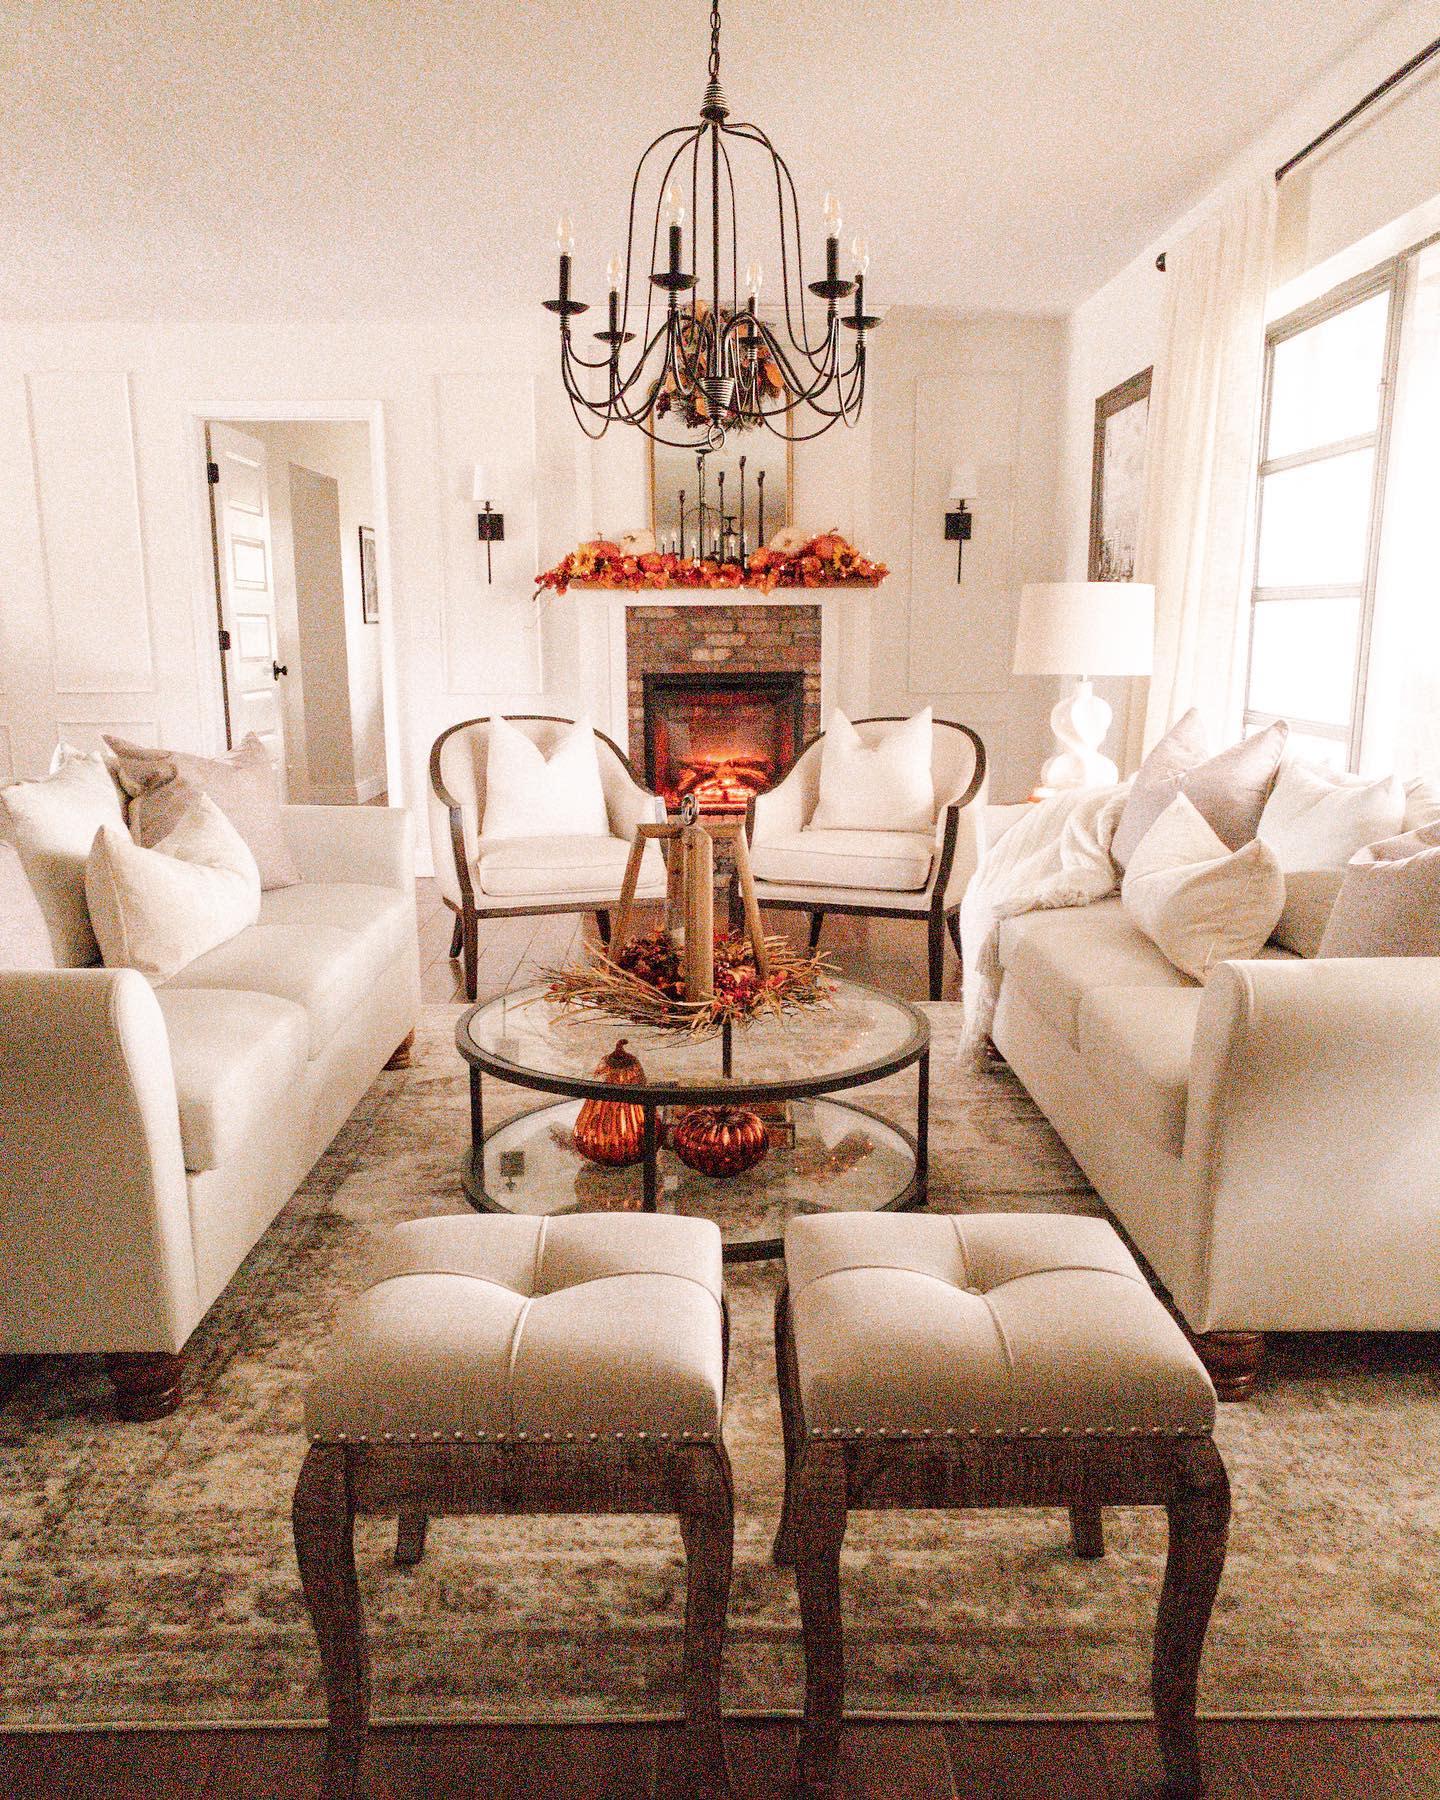 interior-fall-decorating-ideas-jeterdesignhouse